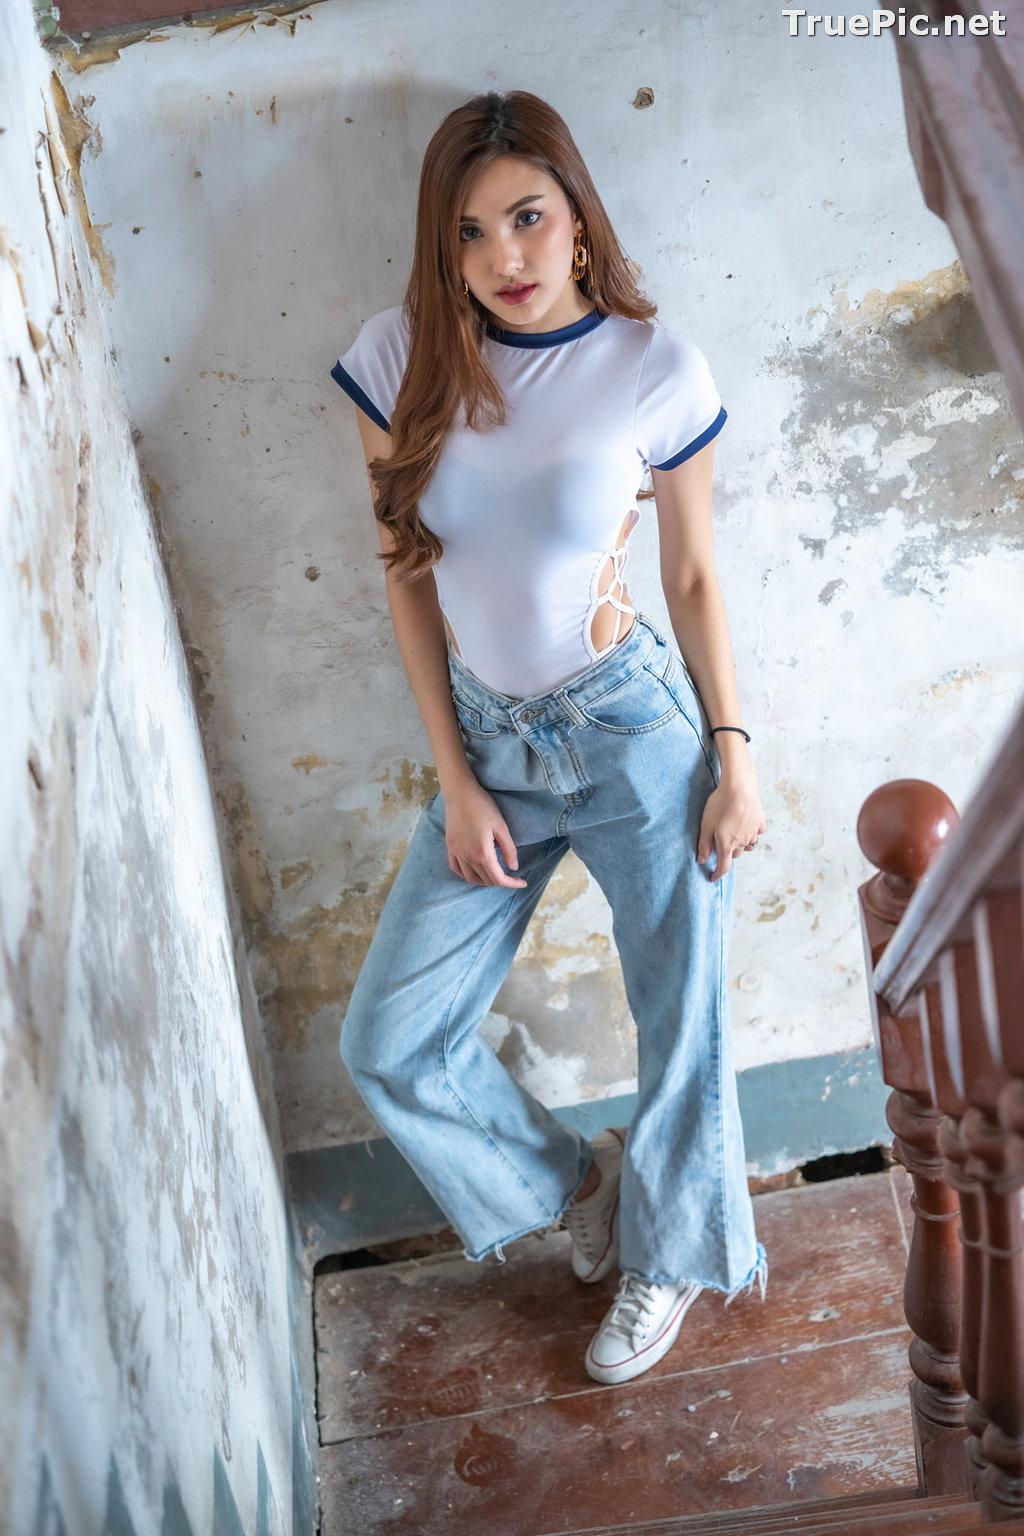 Image Thailand Model - Mynn Sriratampai (Mynn) - Beautiful Picture 2021 Collection - TruePic.net - Picture-77